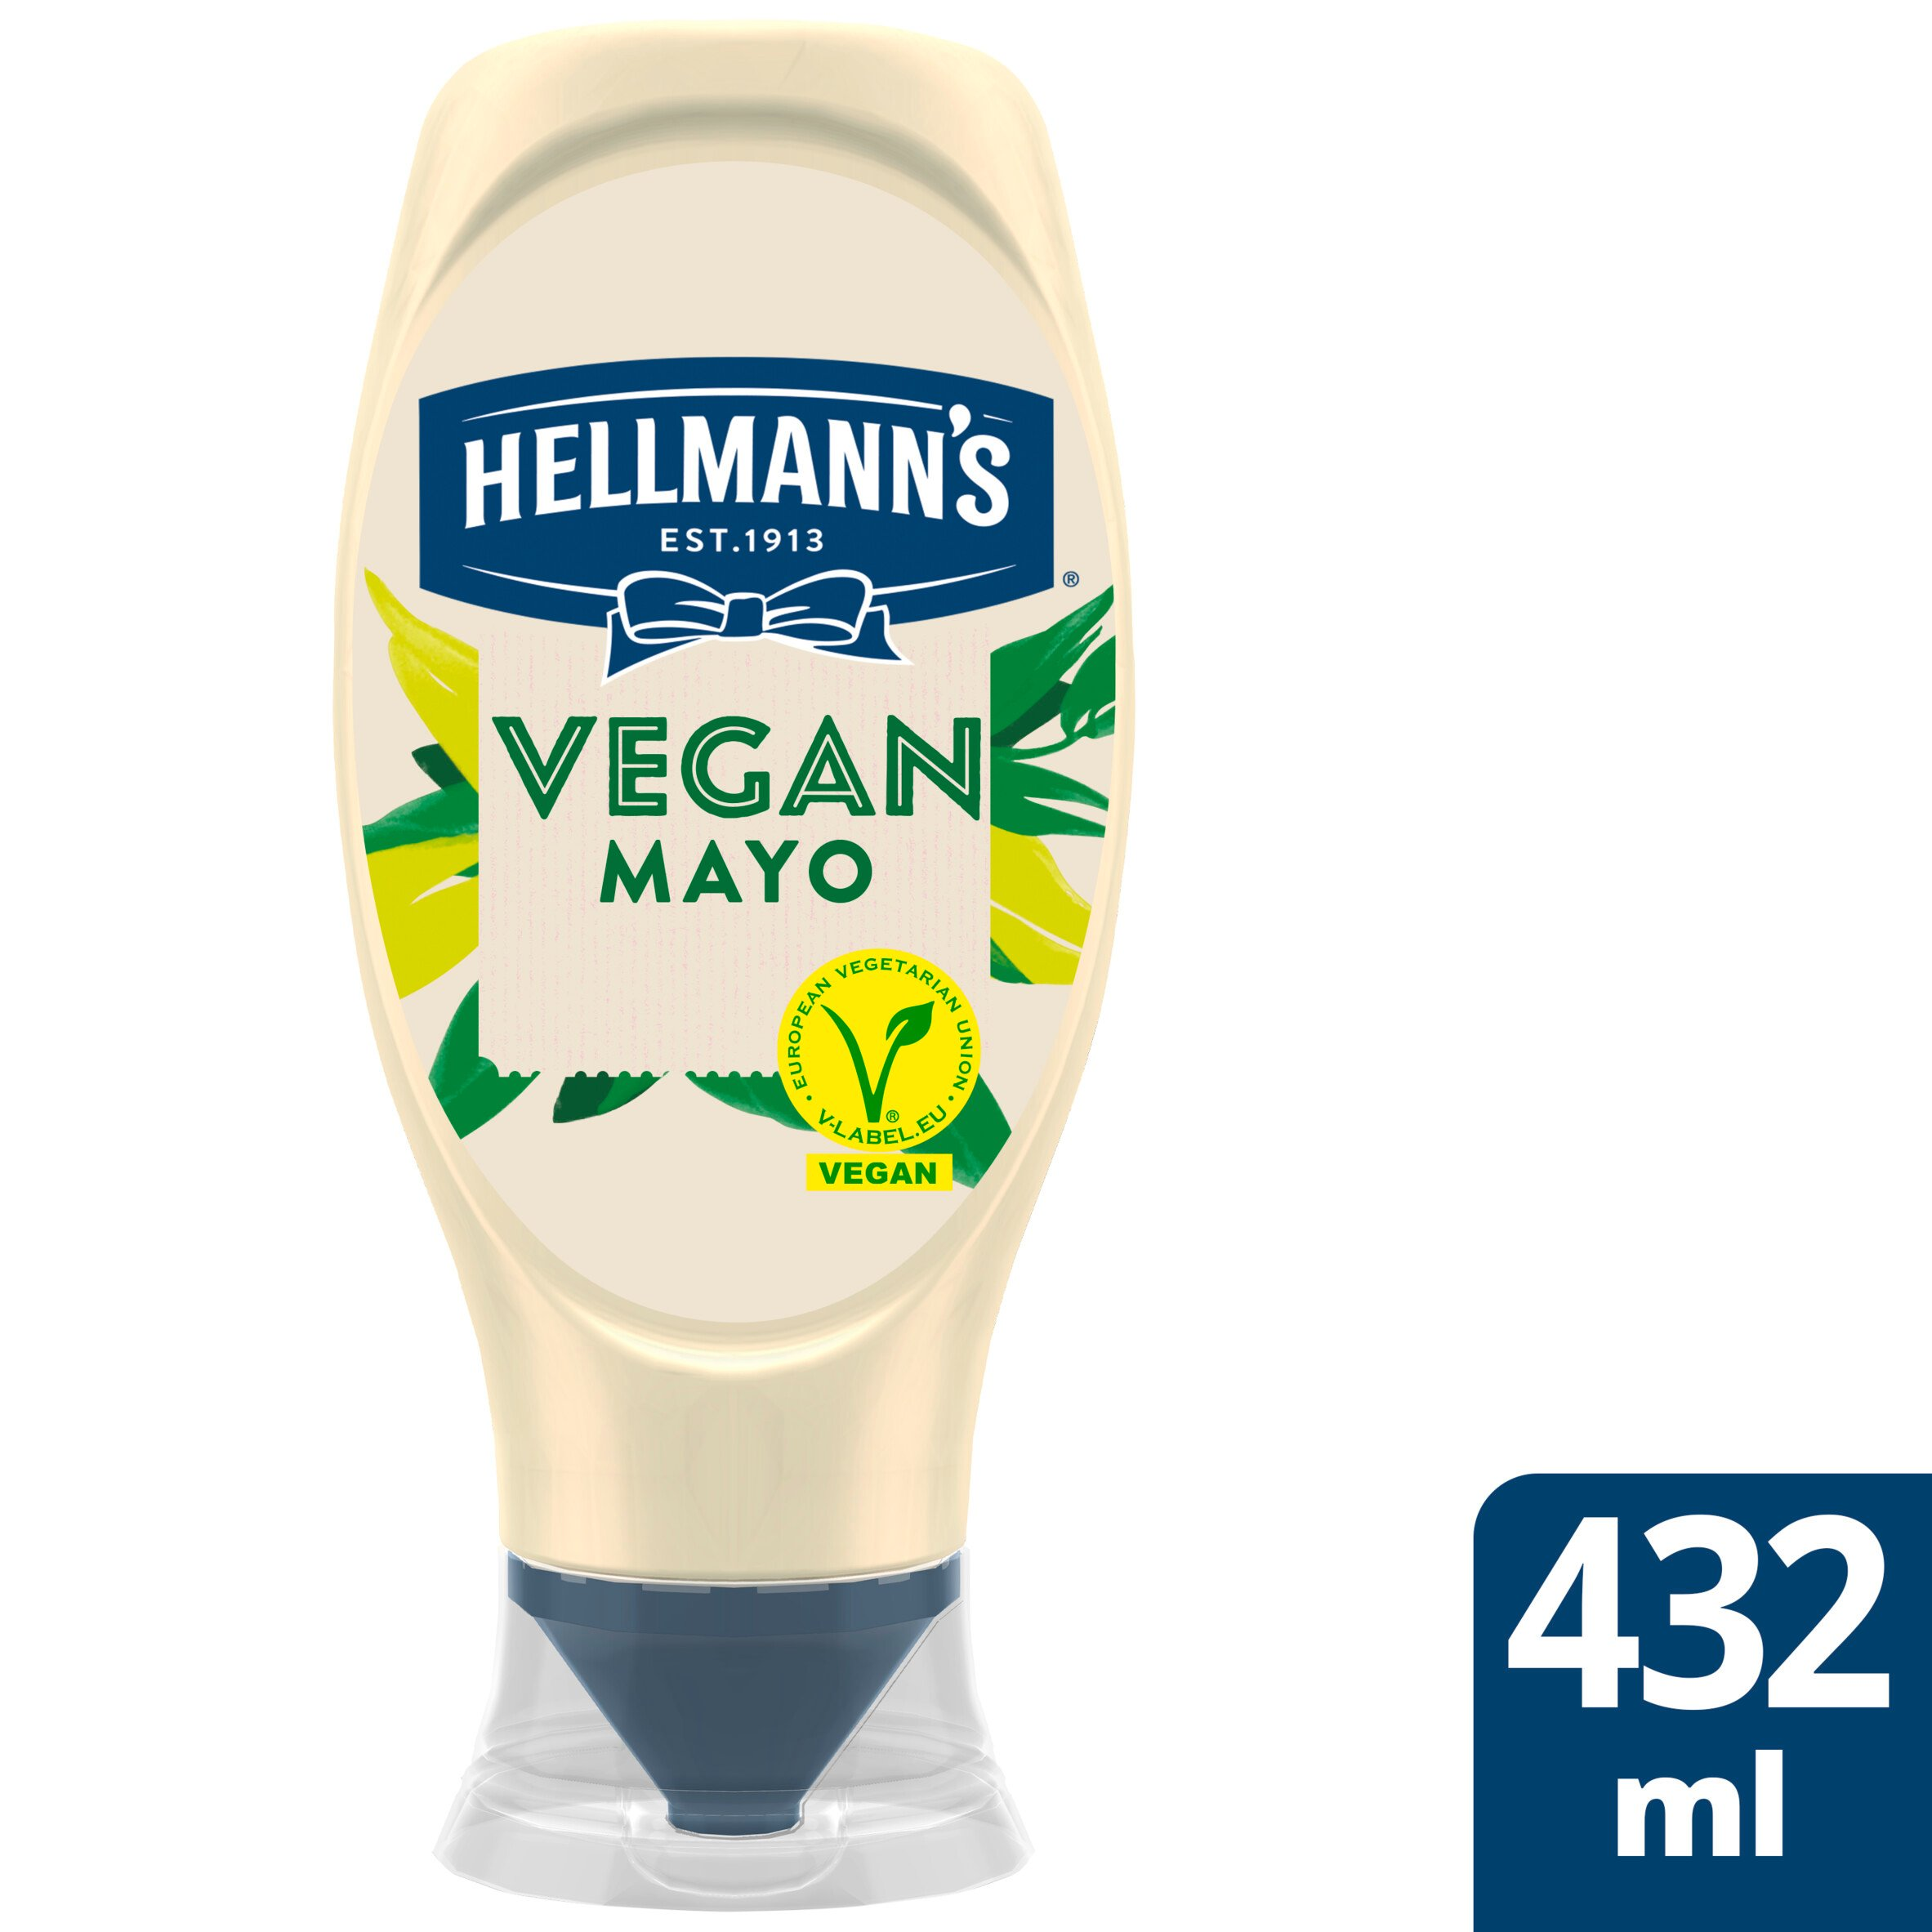 Hellmann's Vegan Mayonnaise 394G